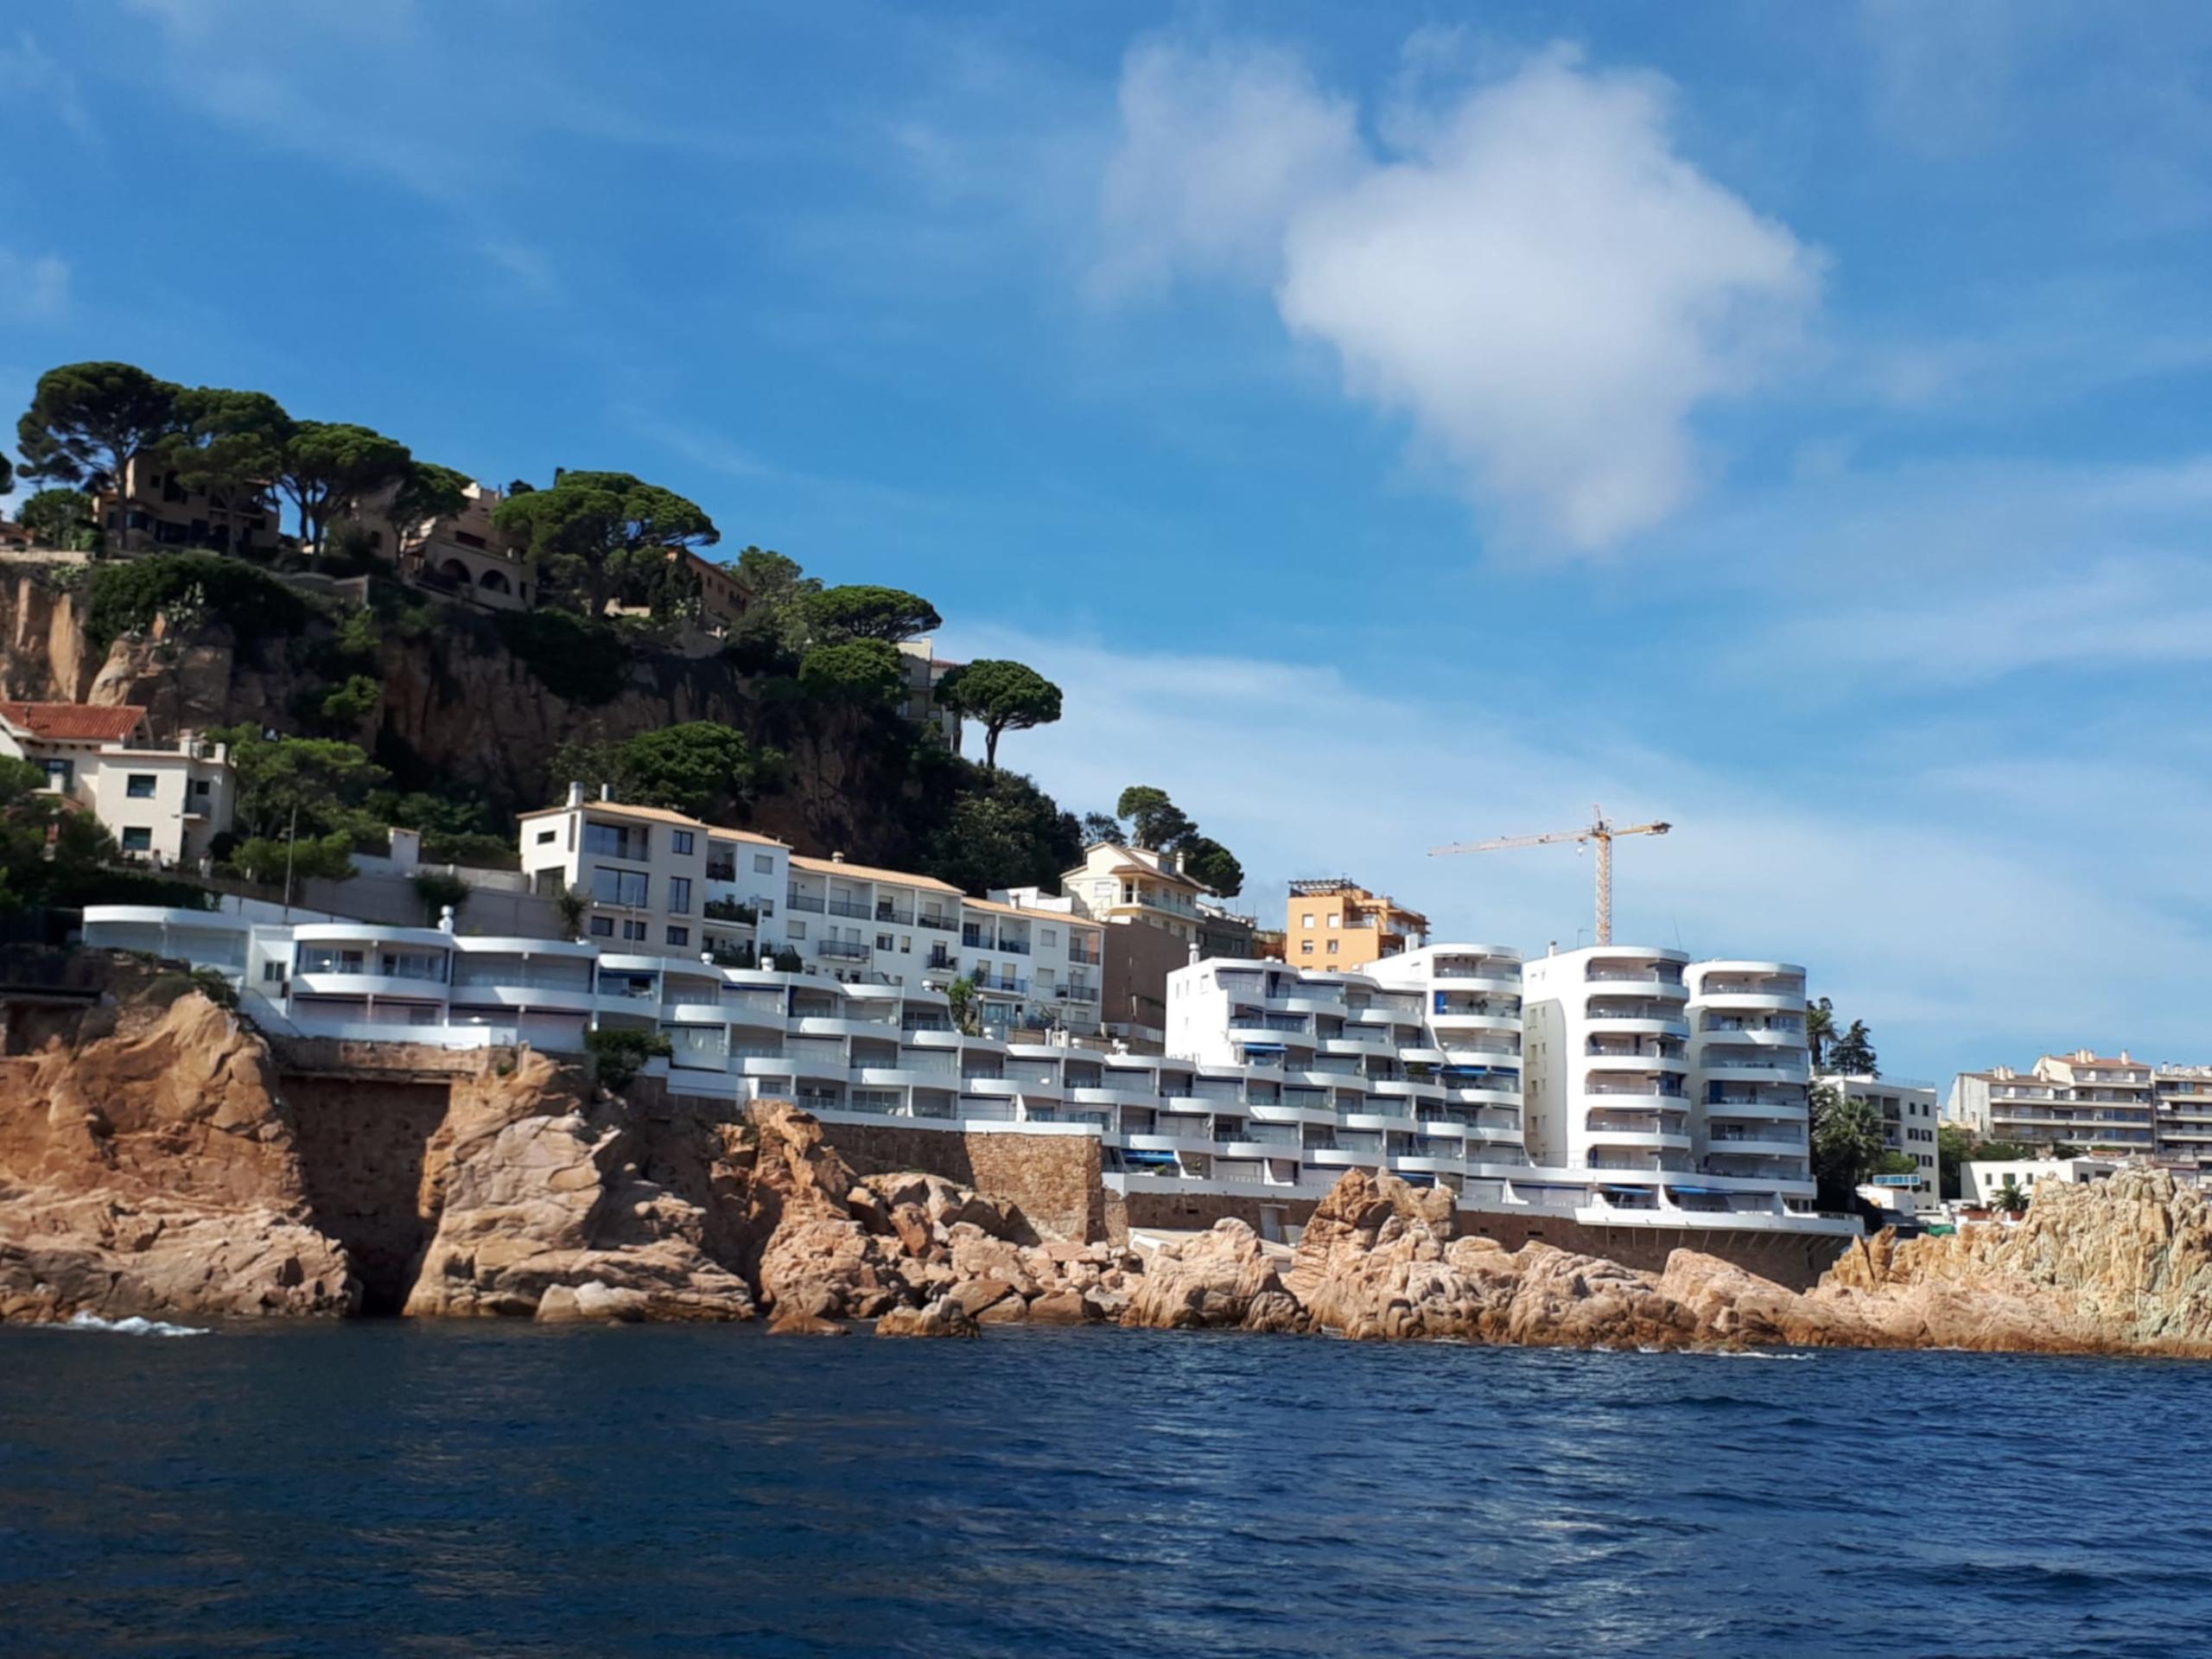 Un edifici a tocar de mar | SOS Costa Brava